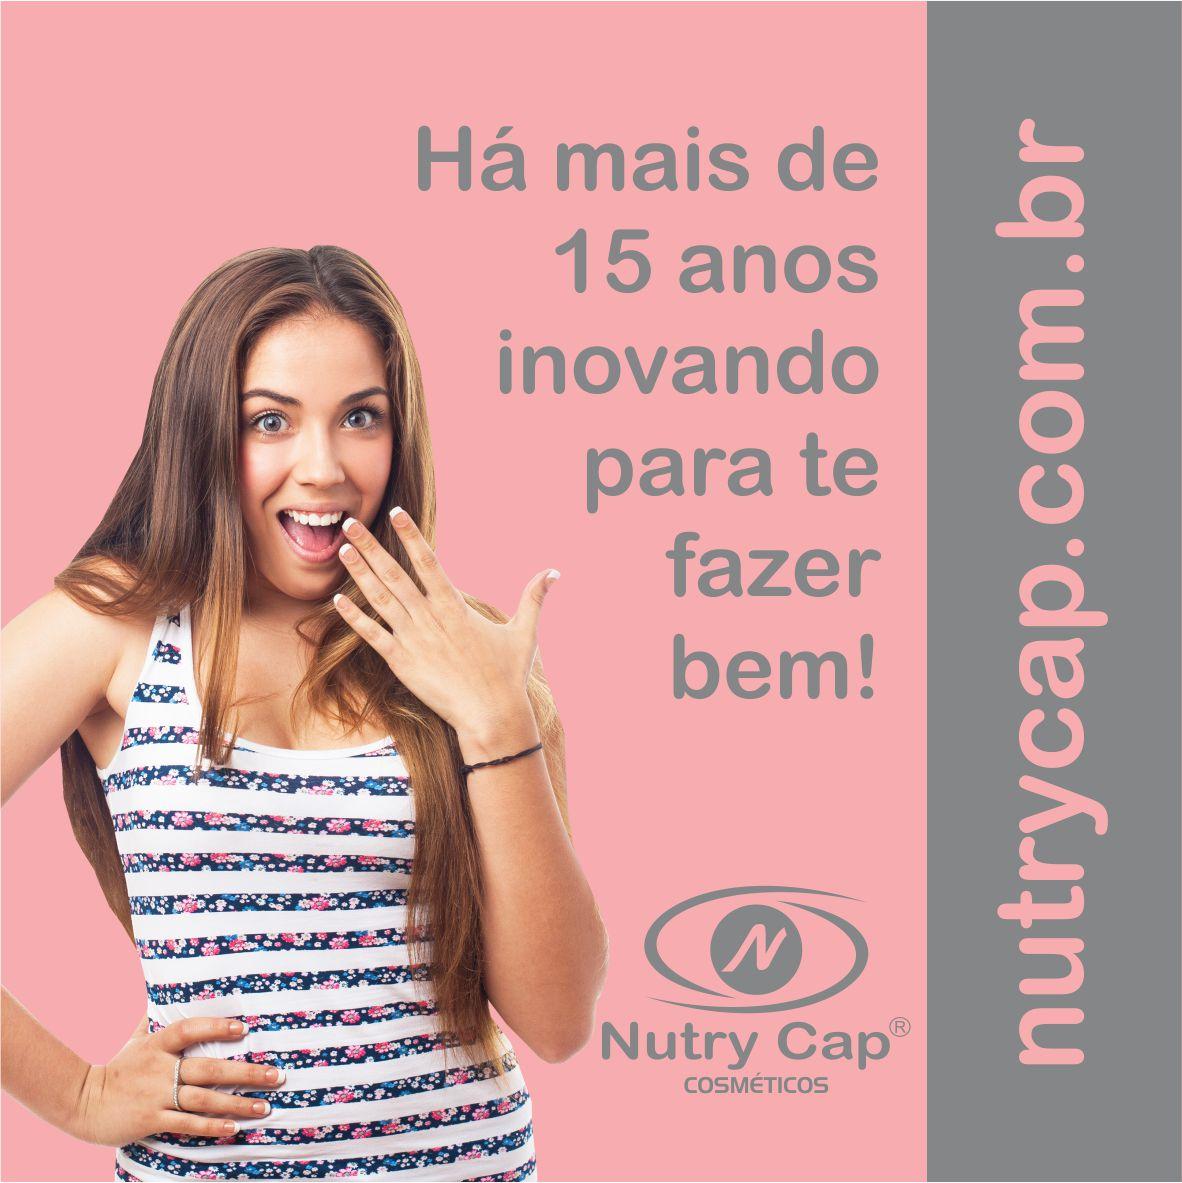 Nutry Cap